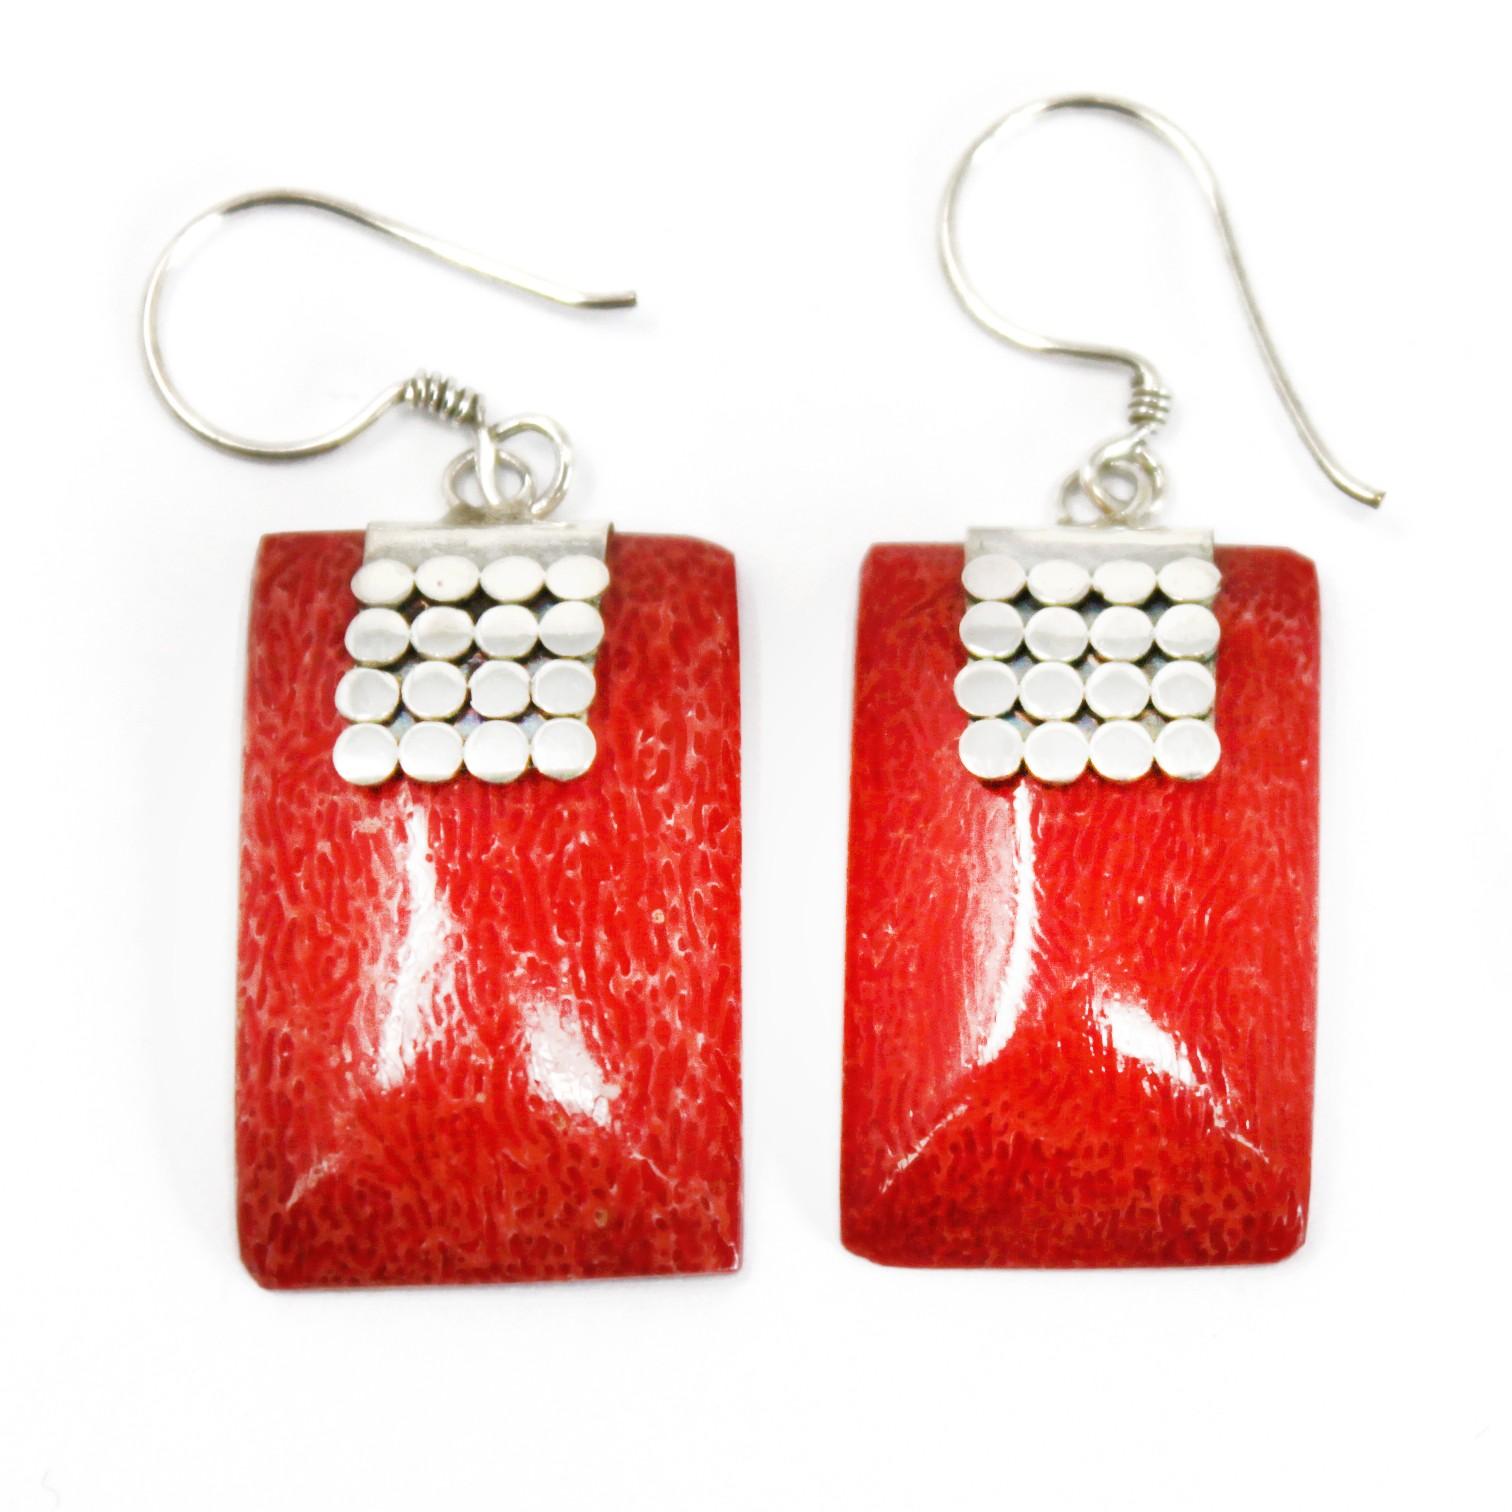 Coral Style Silver Earrings SQ Mini Discs